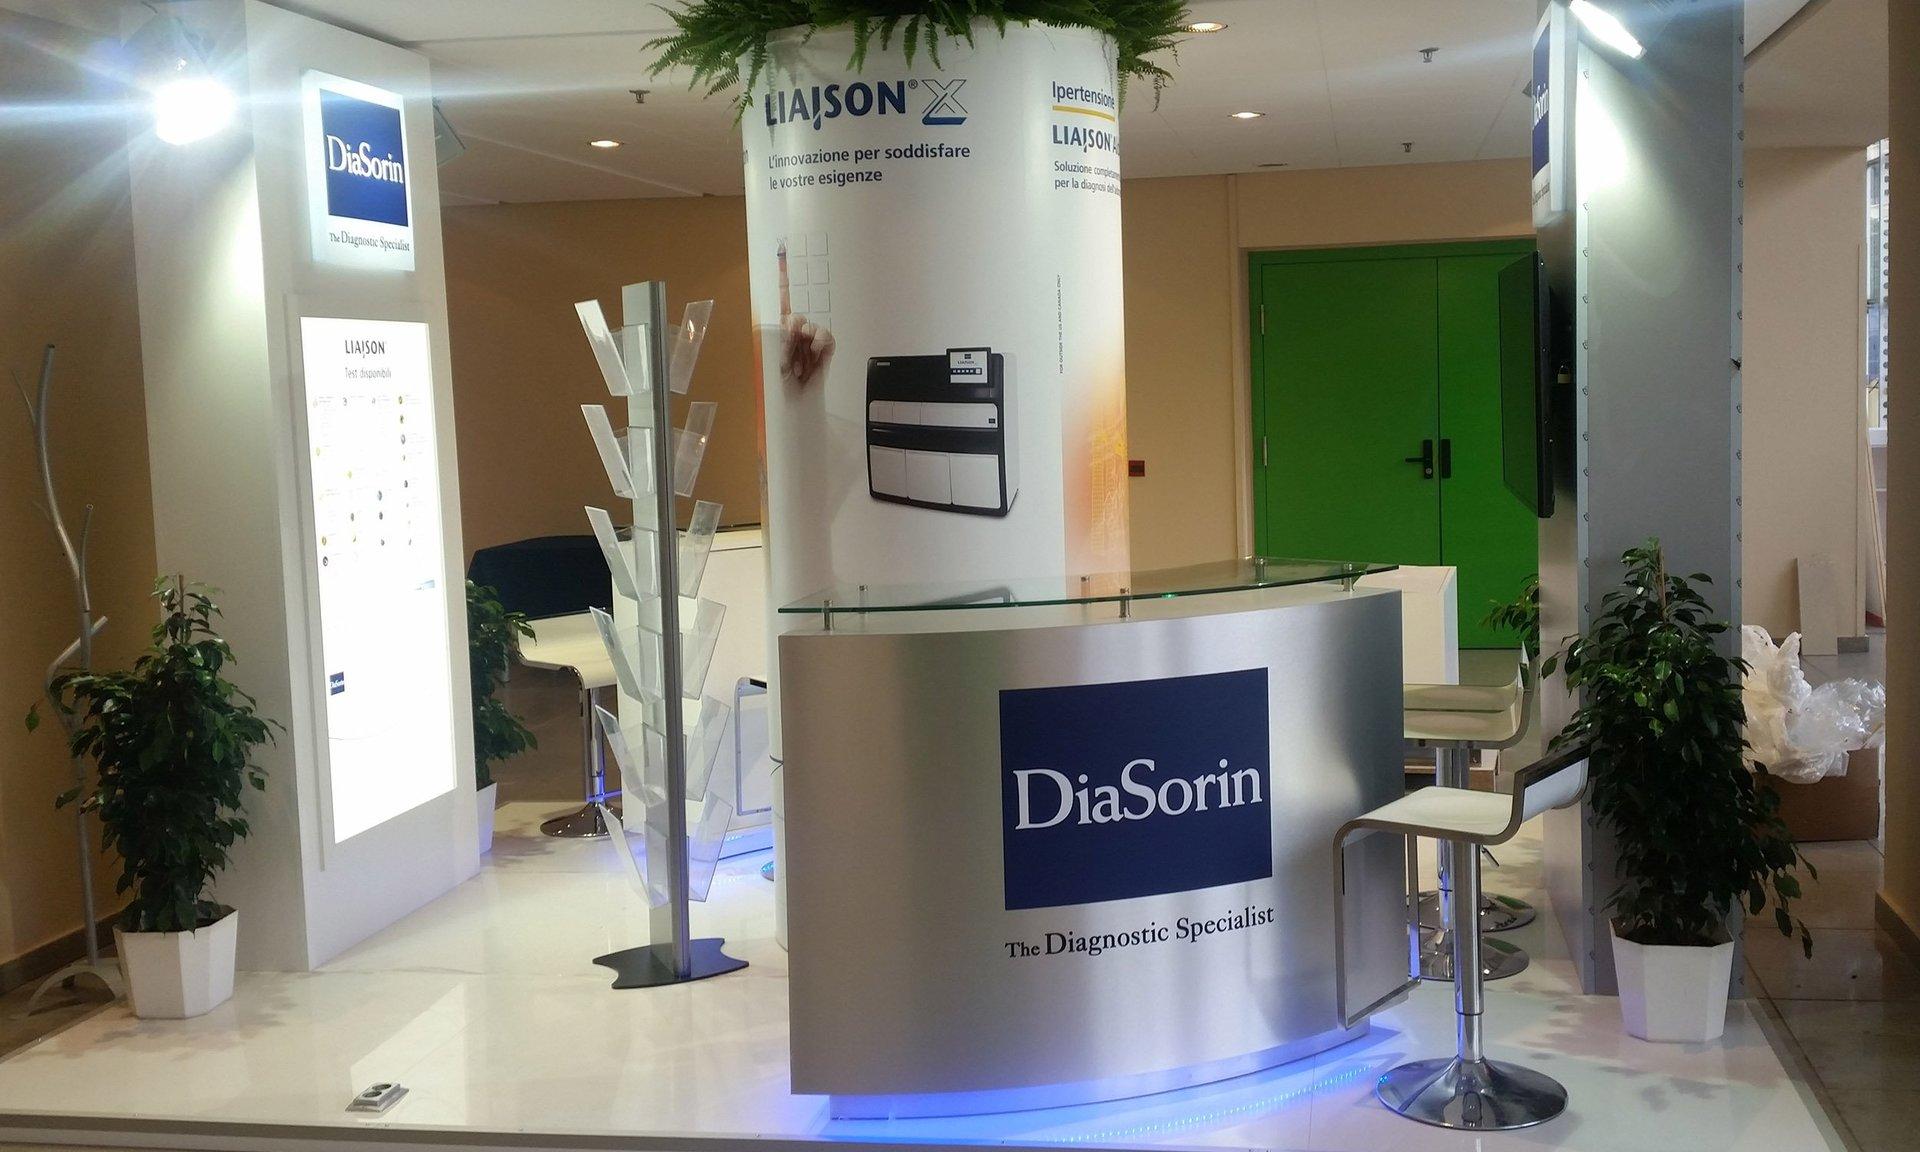 una reception del Diasorin con un bancone e uno sgabello